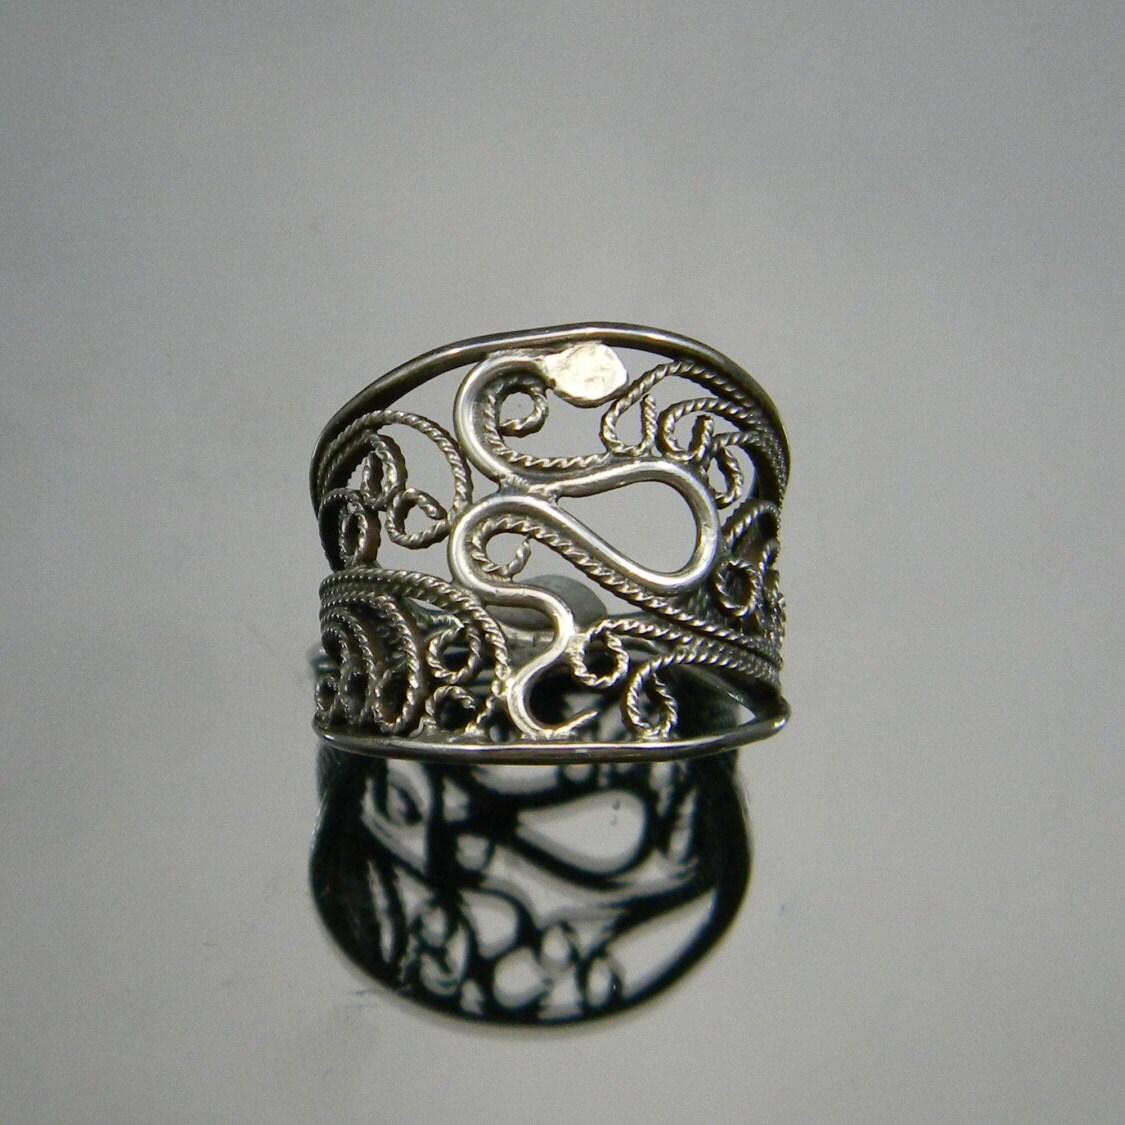 snake ring silver filigree filigree ring cigar band rings. Black Bedroom Furniture Sets. Home Design Ideas